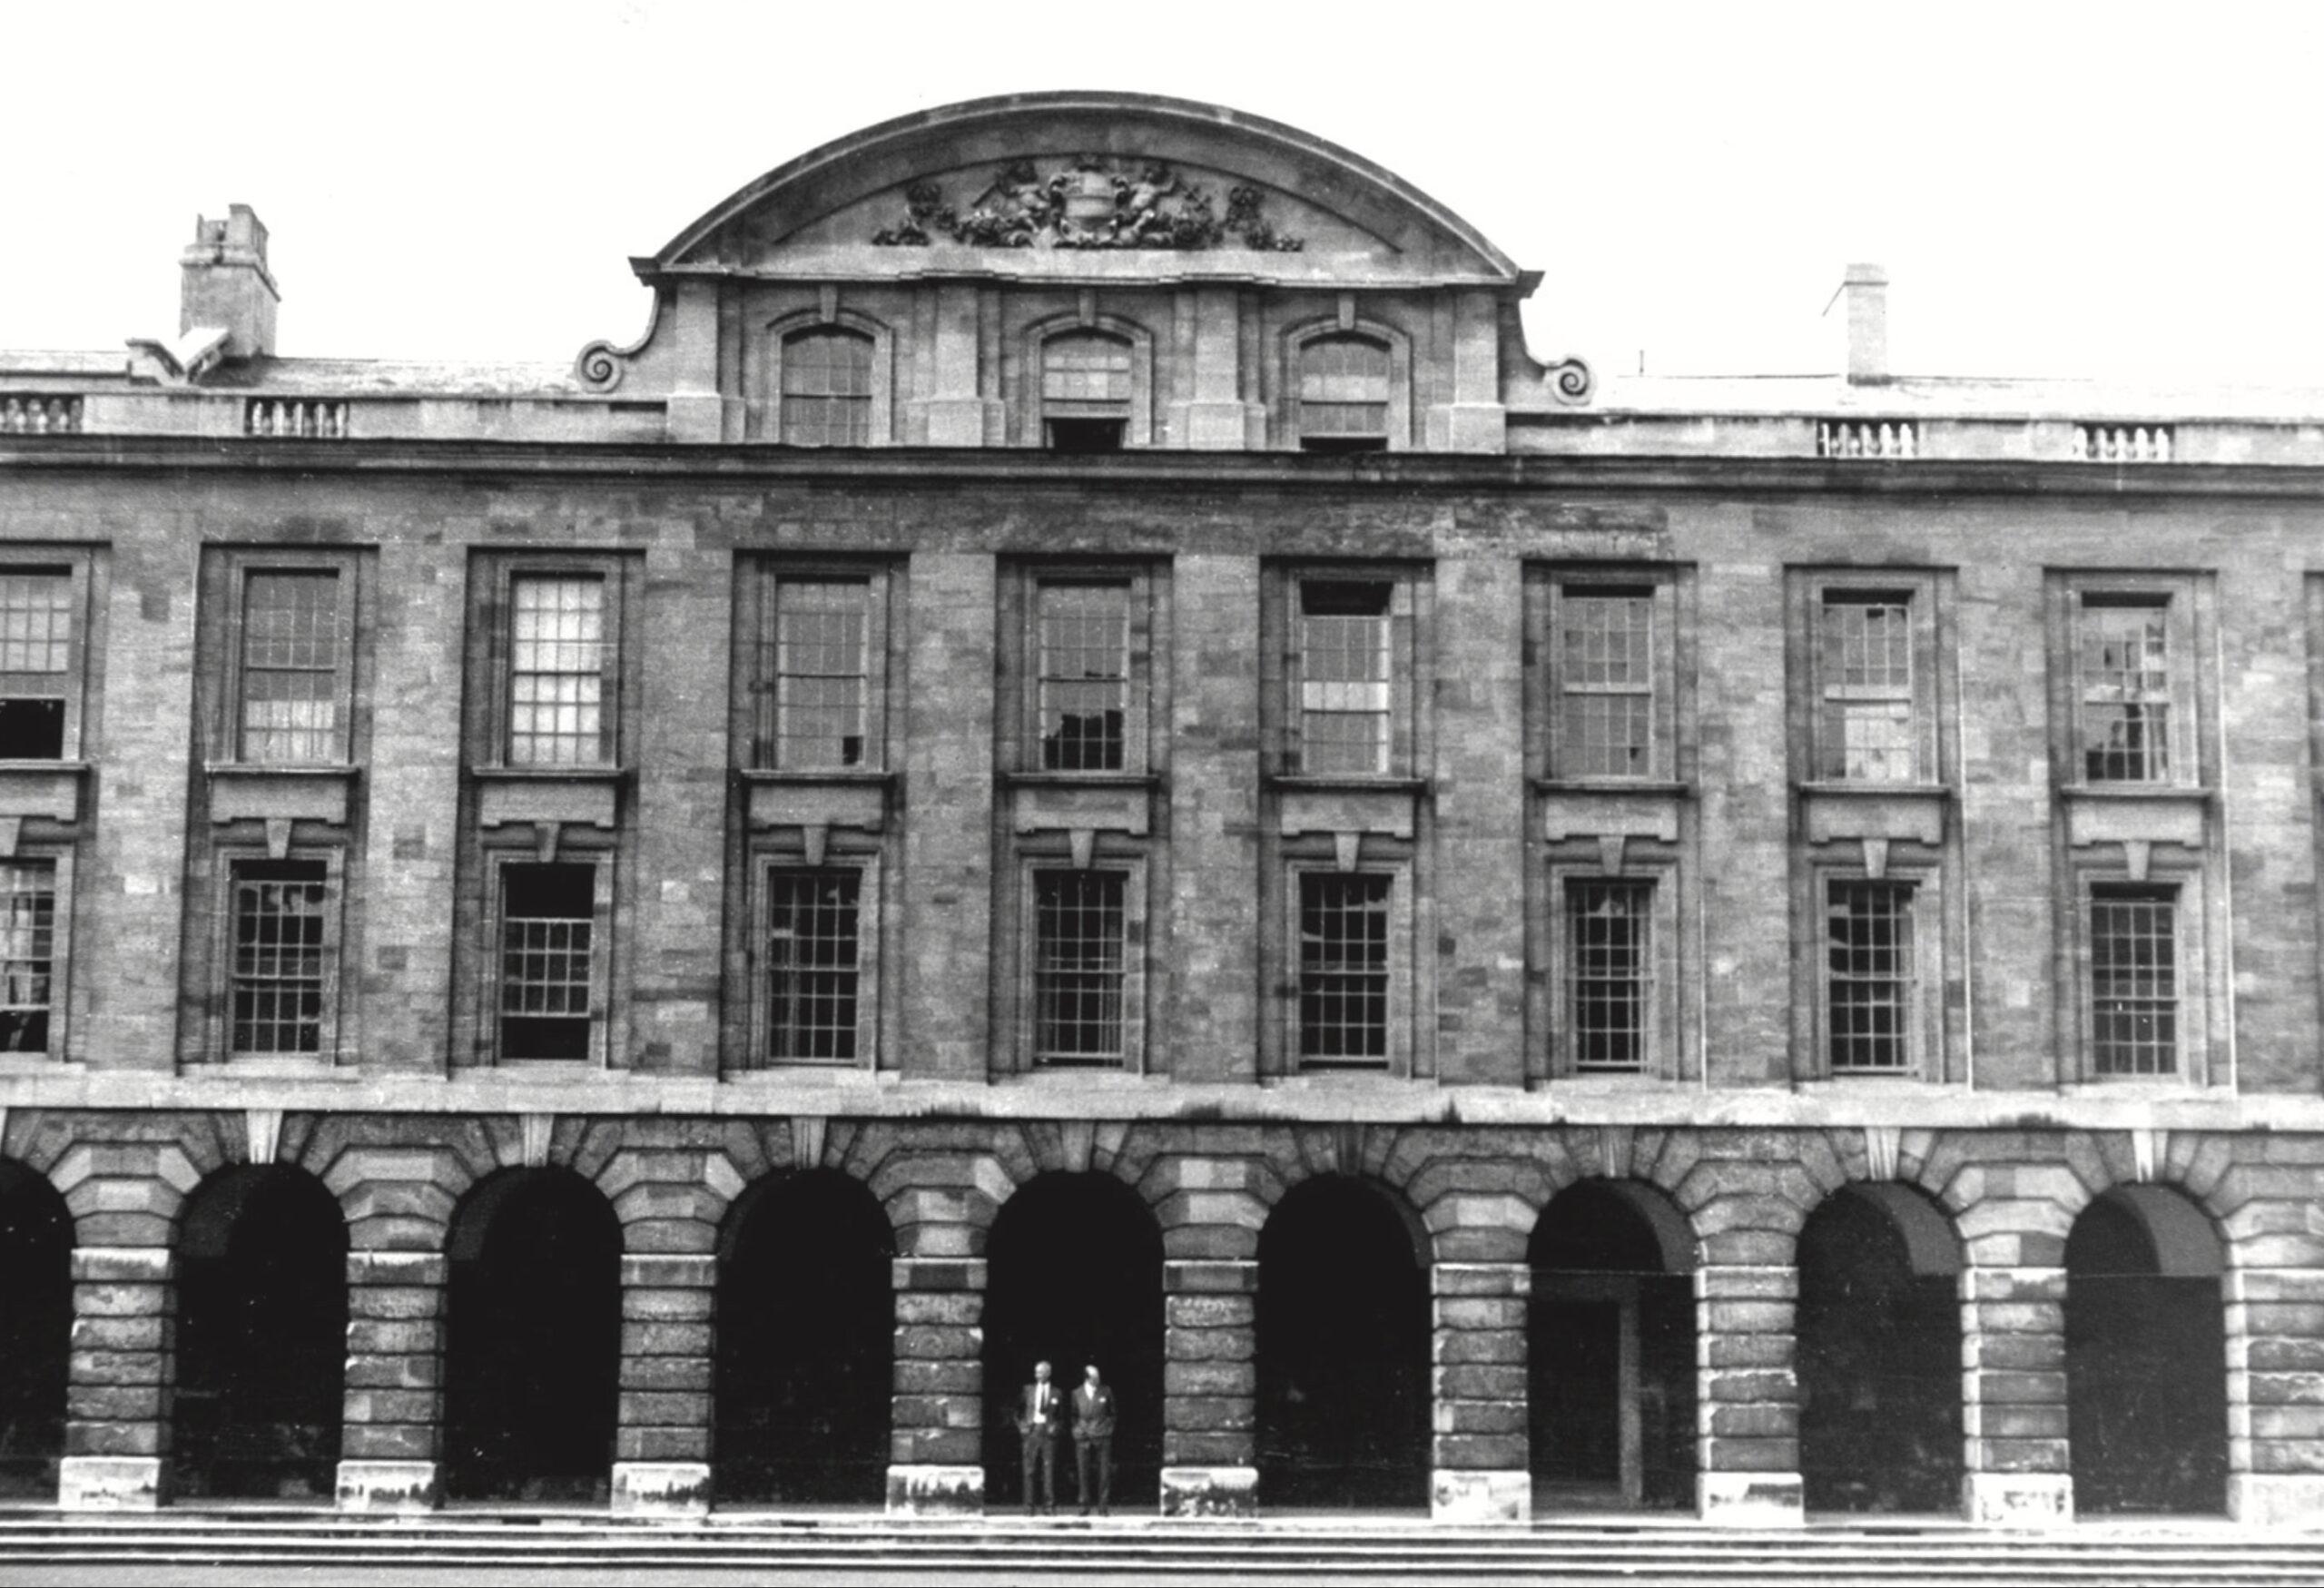 Queens College Quadrangle at the University of Oxford